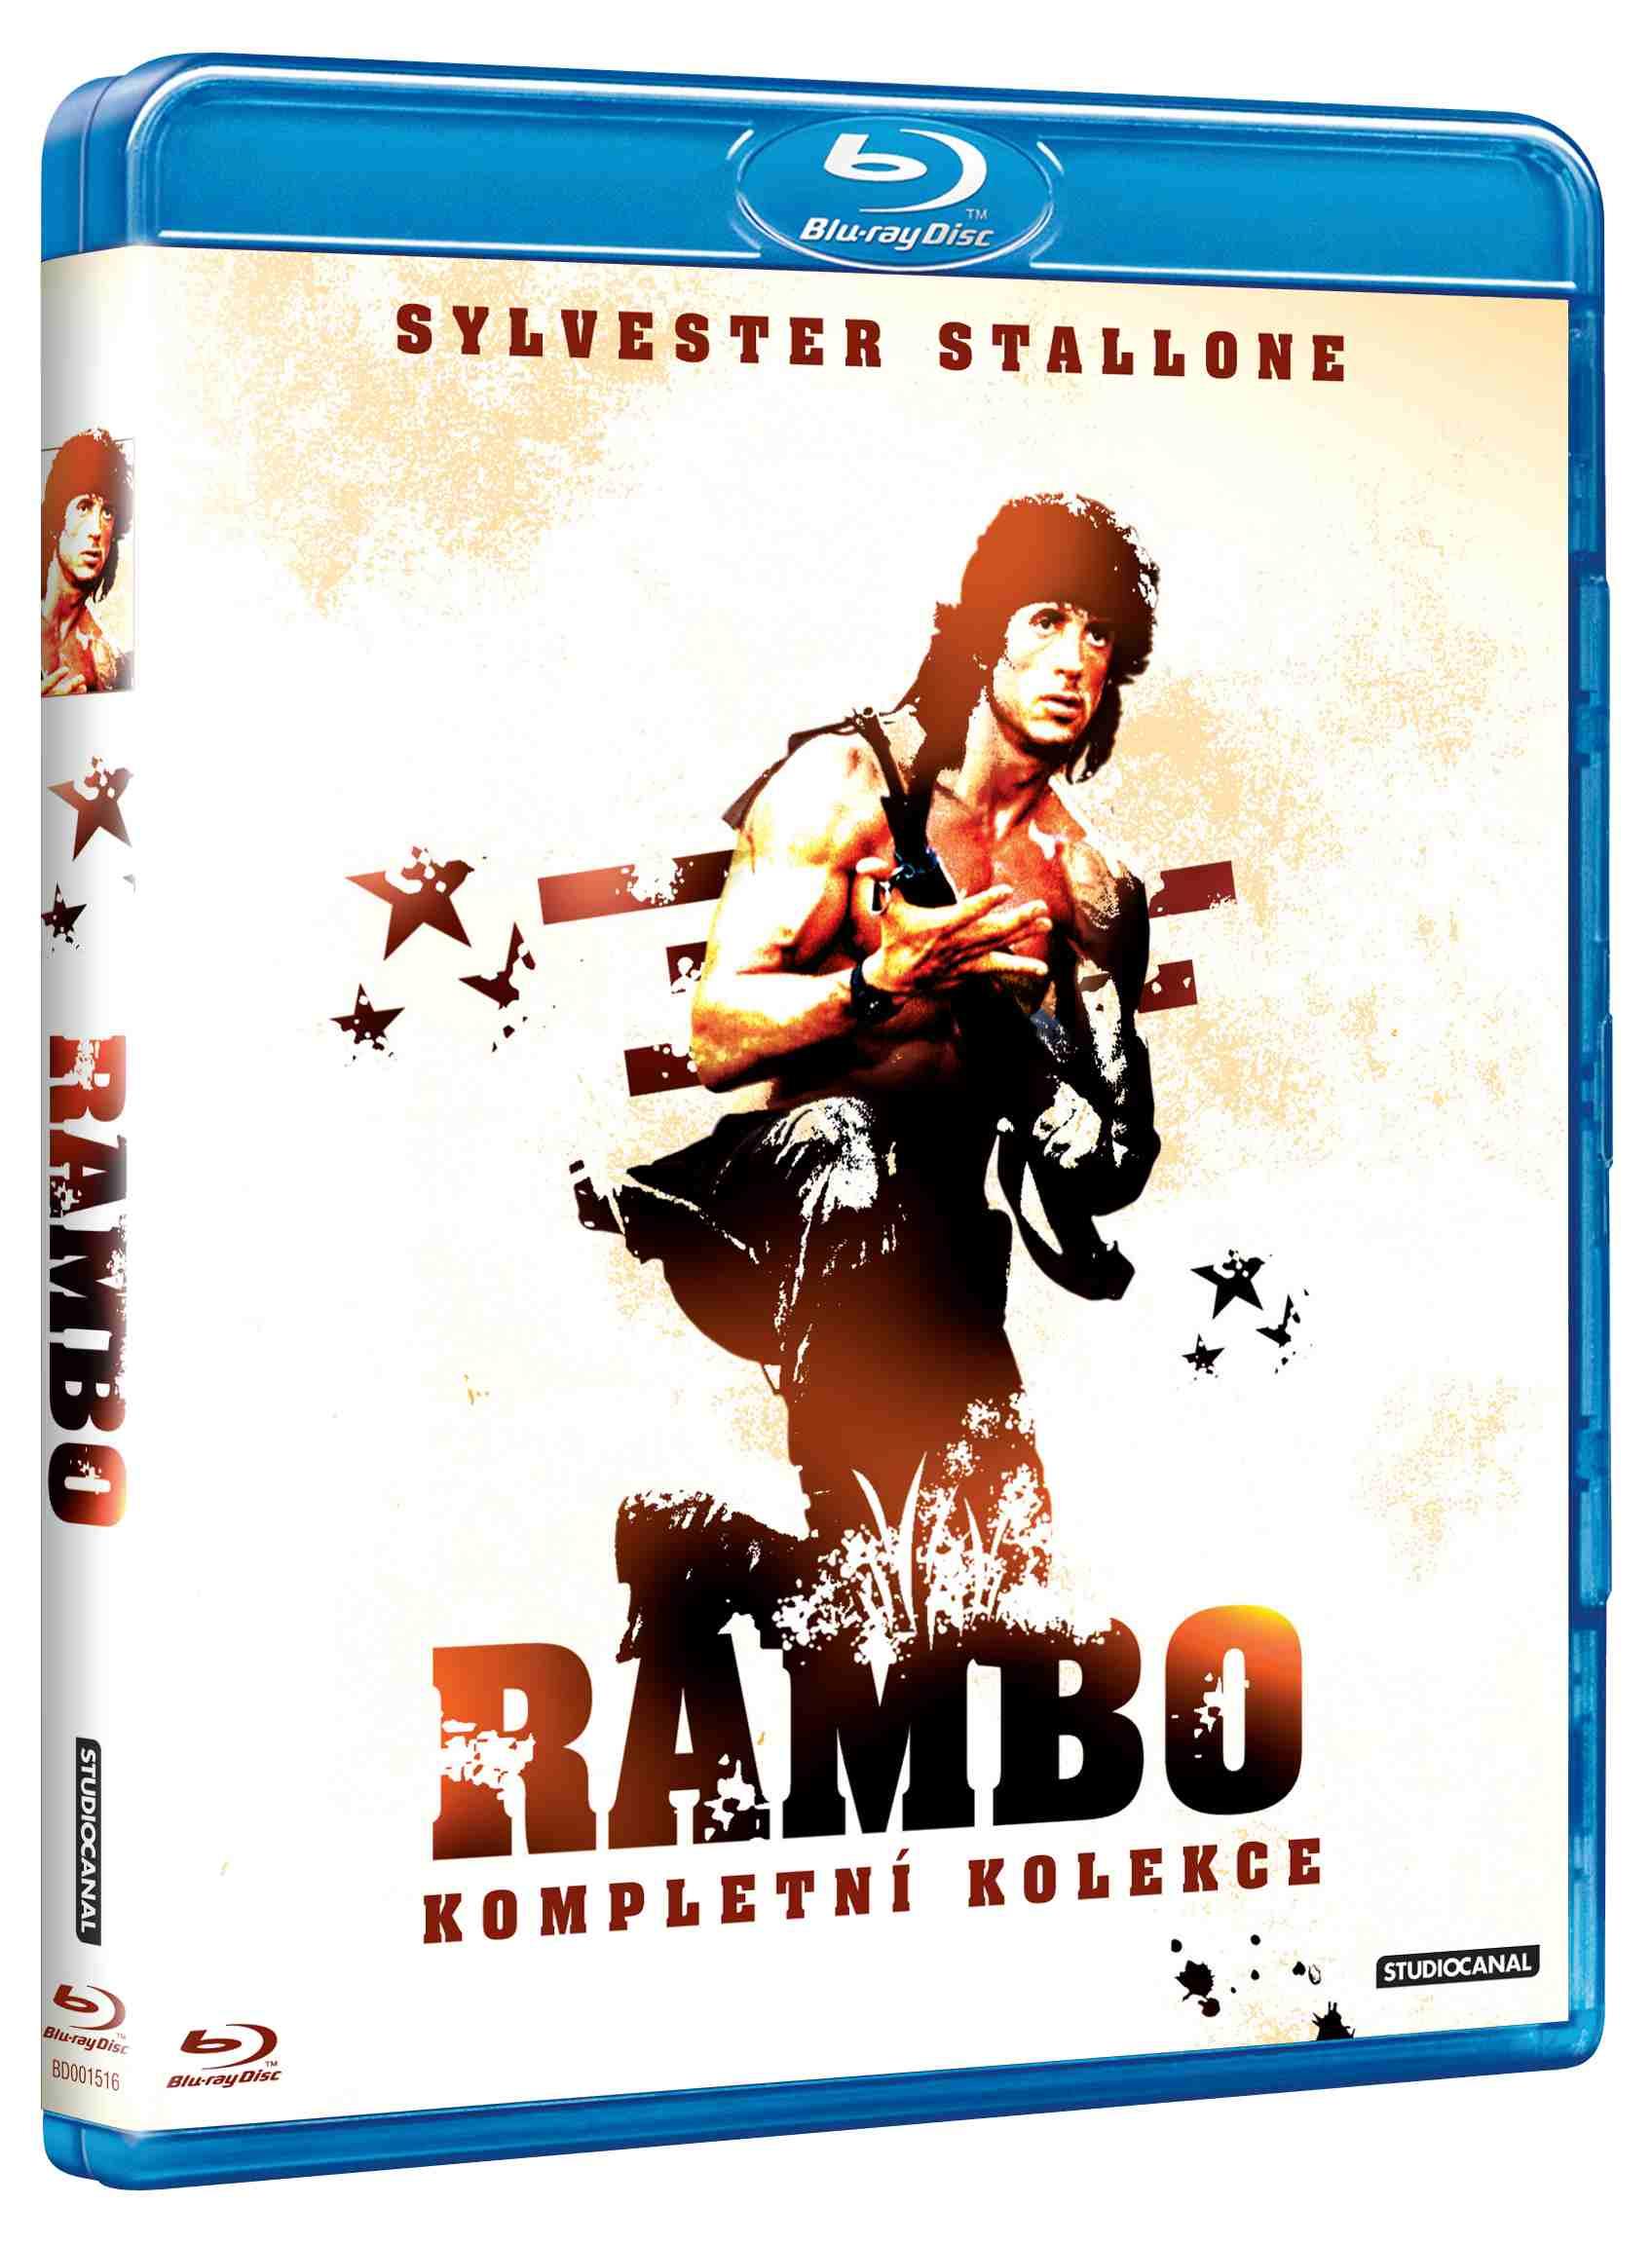 RAMBO 1-3 KOLEKCE (3 BD) - Blu-ray